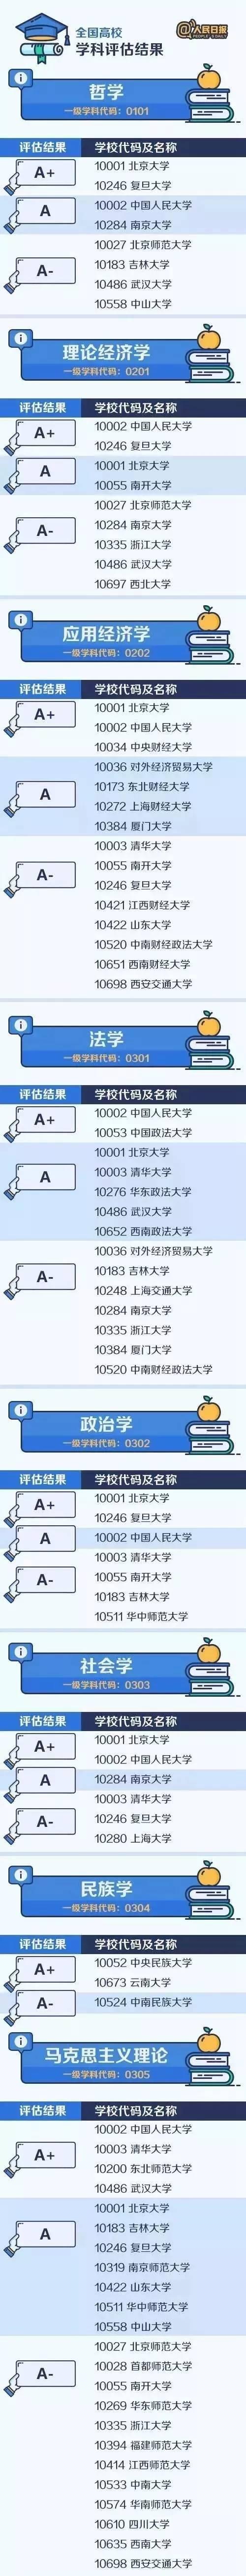 <b>权威!人民日报整理了中国大学最顶尖的学科名单。转给高中家长!</b>